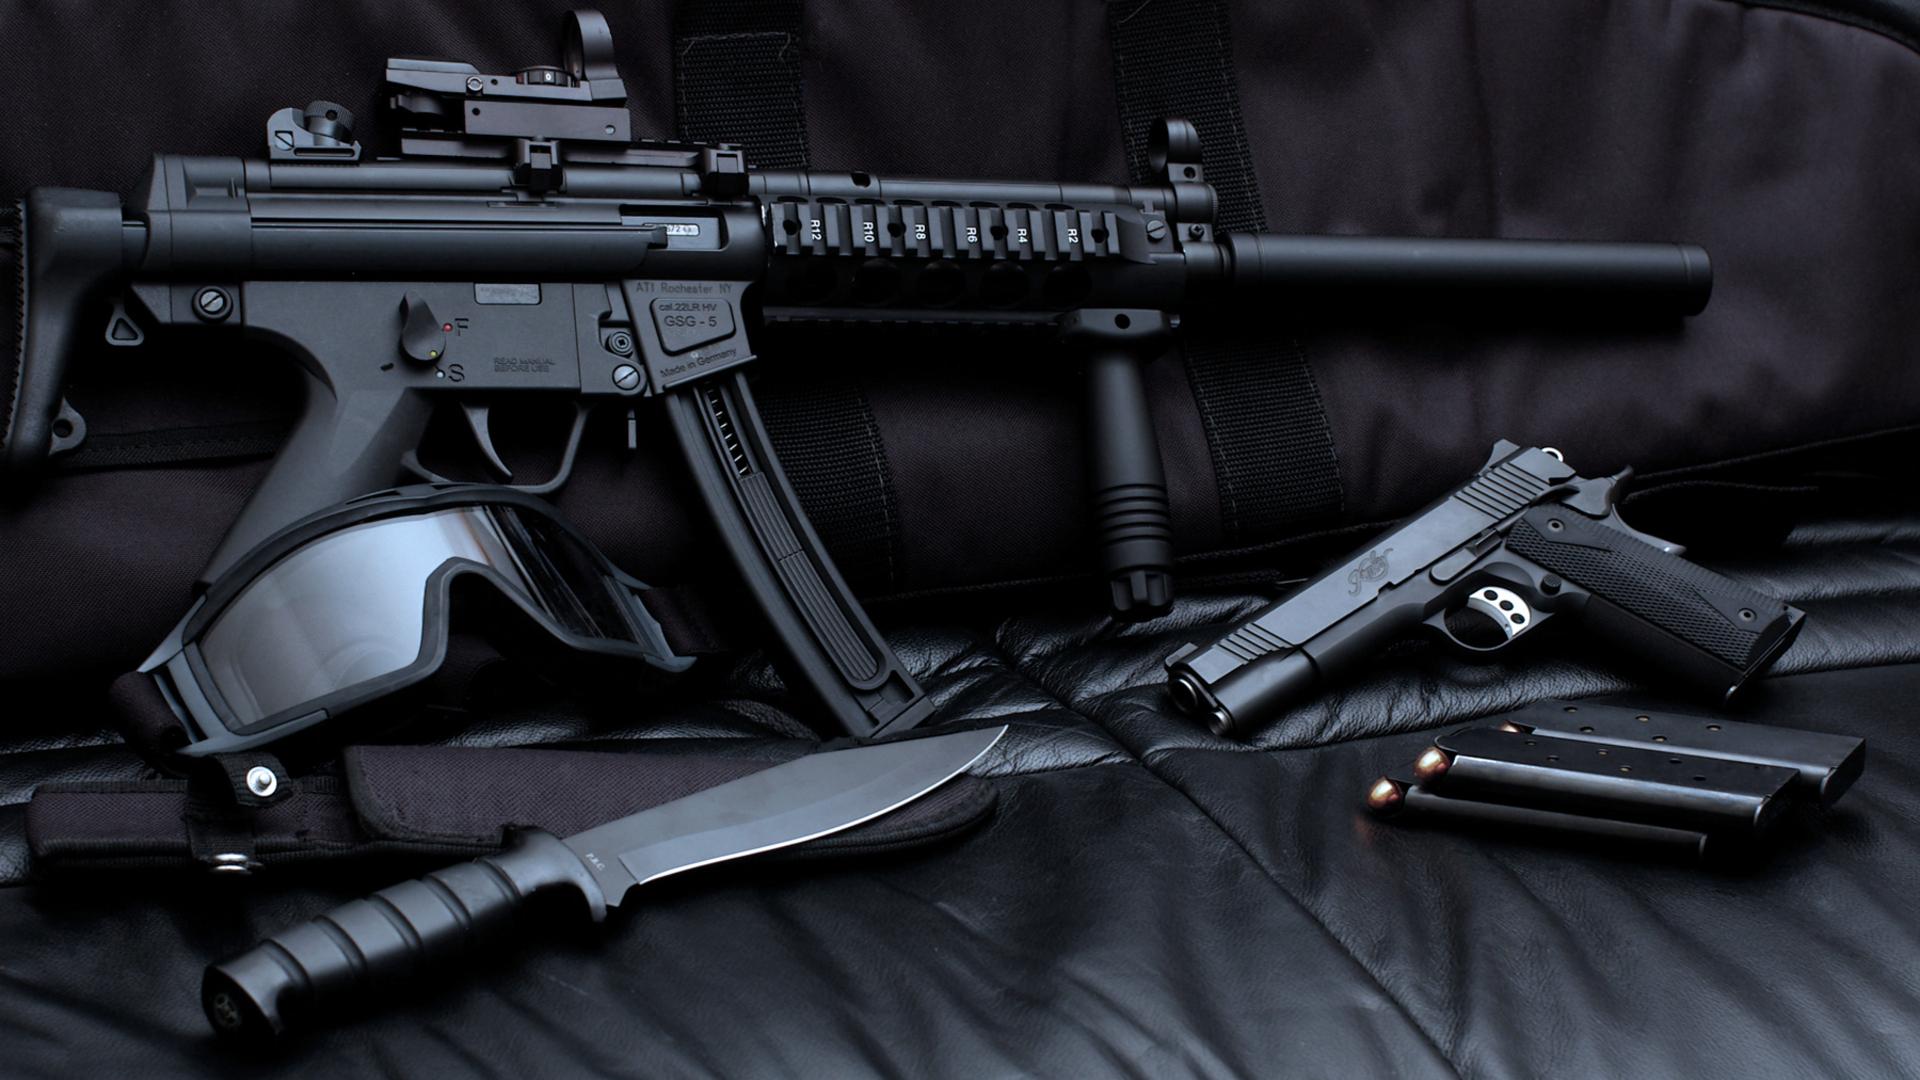 Sniper Gun Pistol Ammo Collection Wallpaper   StylishHDWallpapers 1920x1080